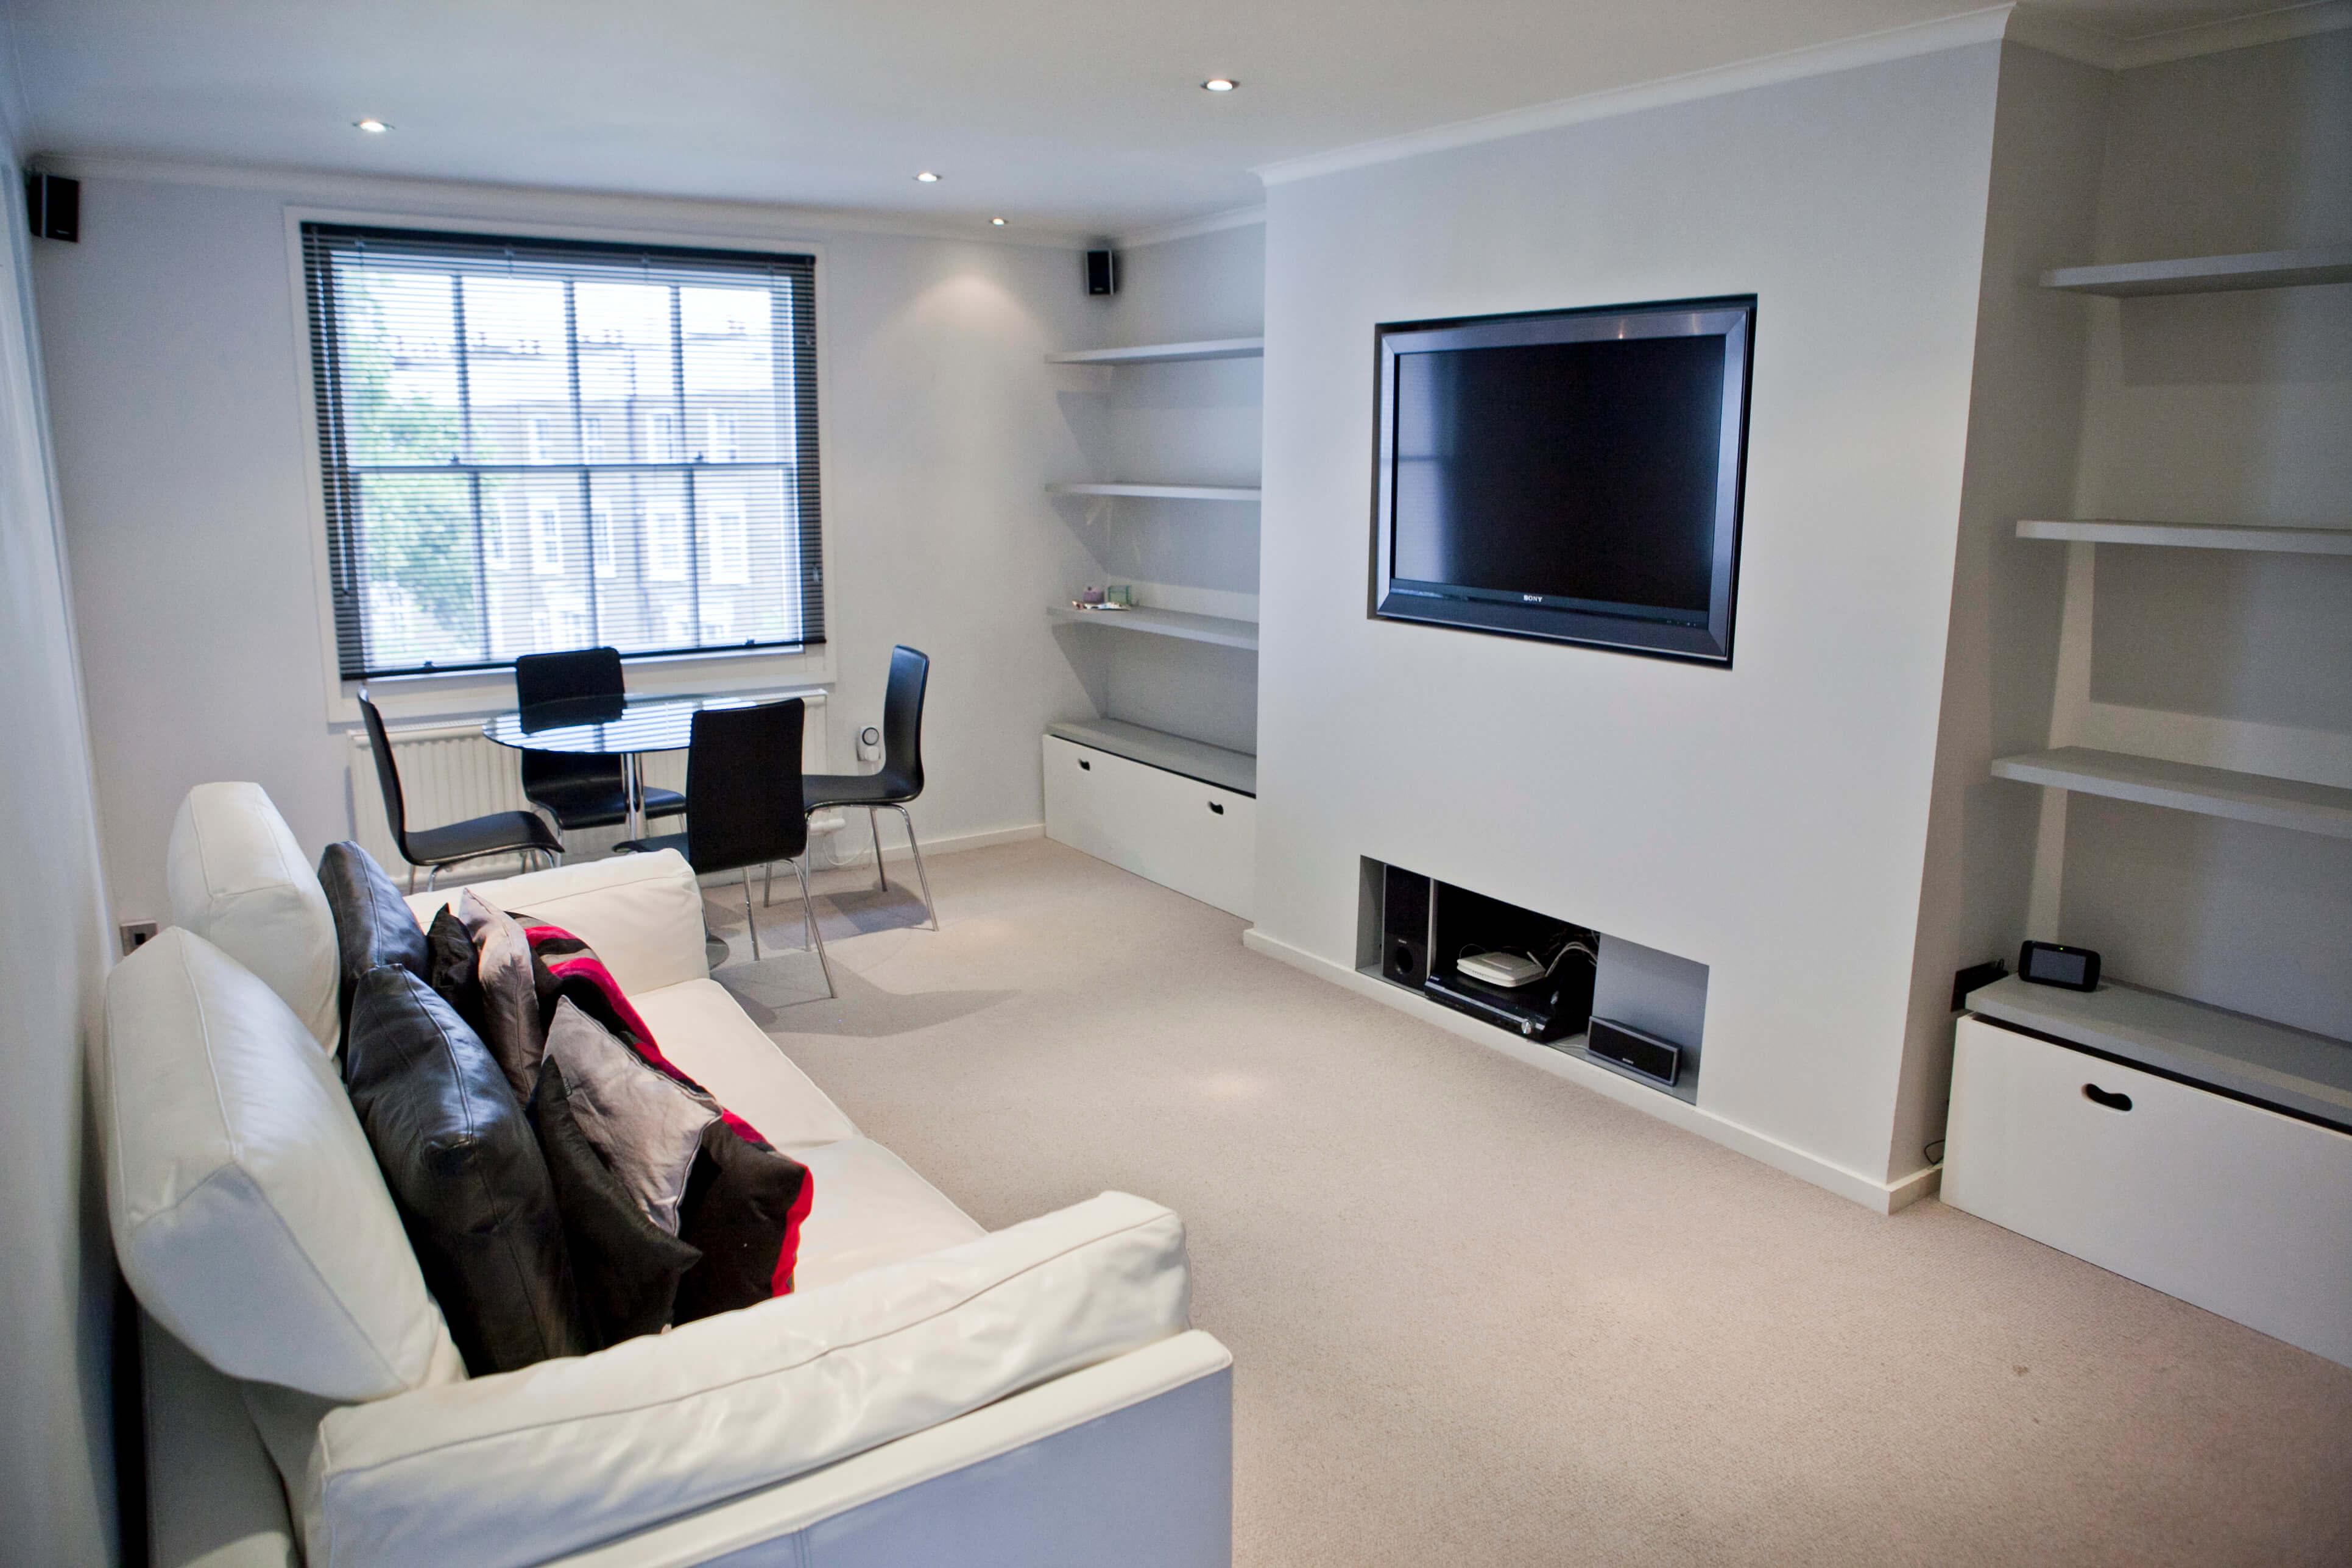 IMG 30971 - Flats & Apartments